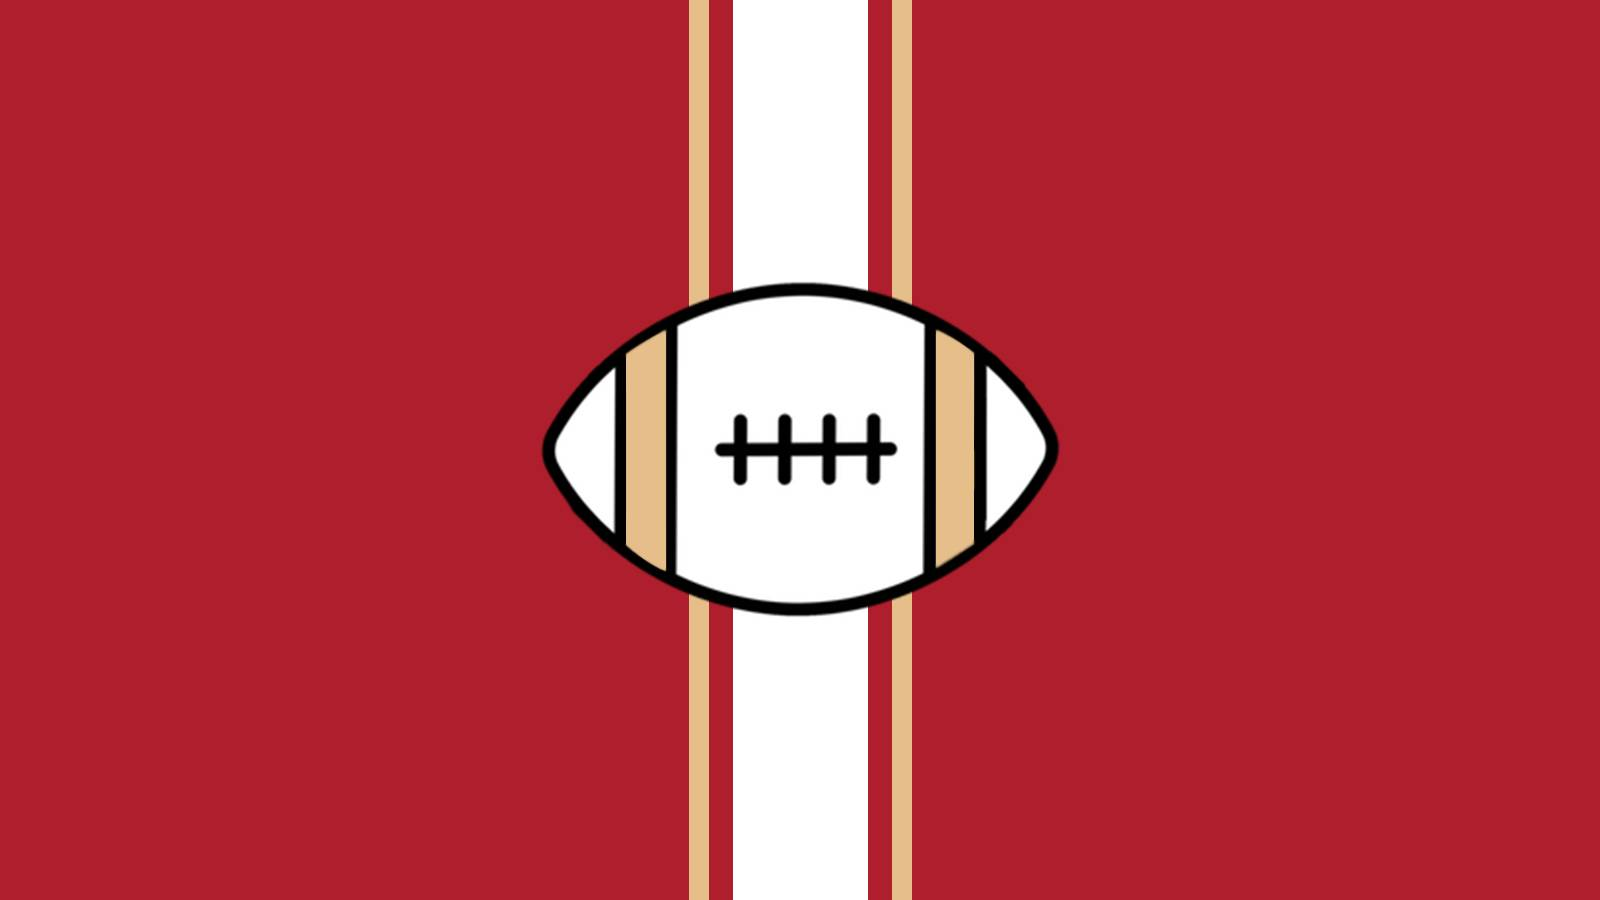 Arizona Cardinals at San Francisco 49ers